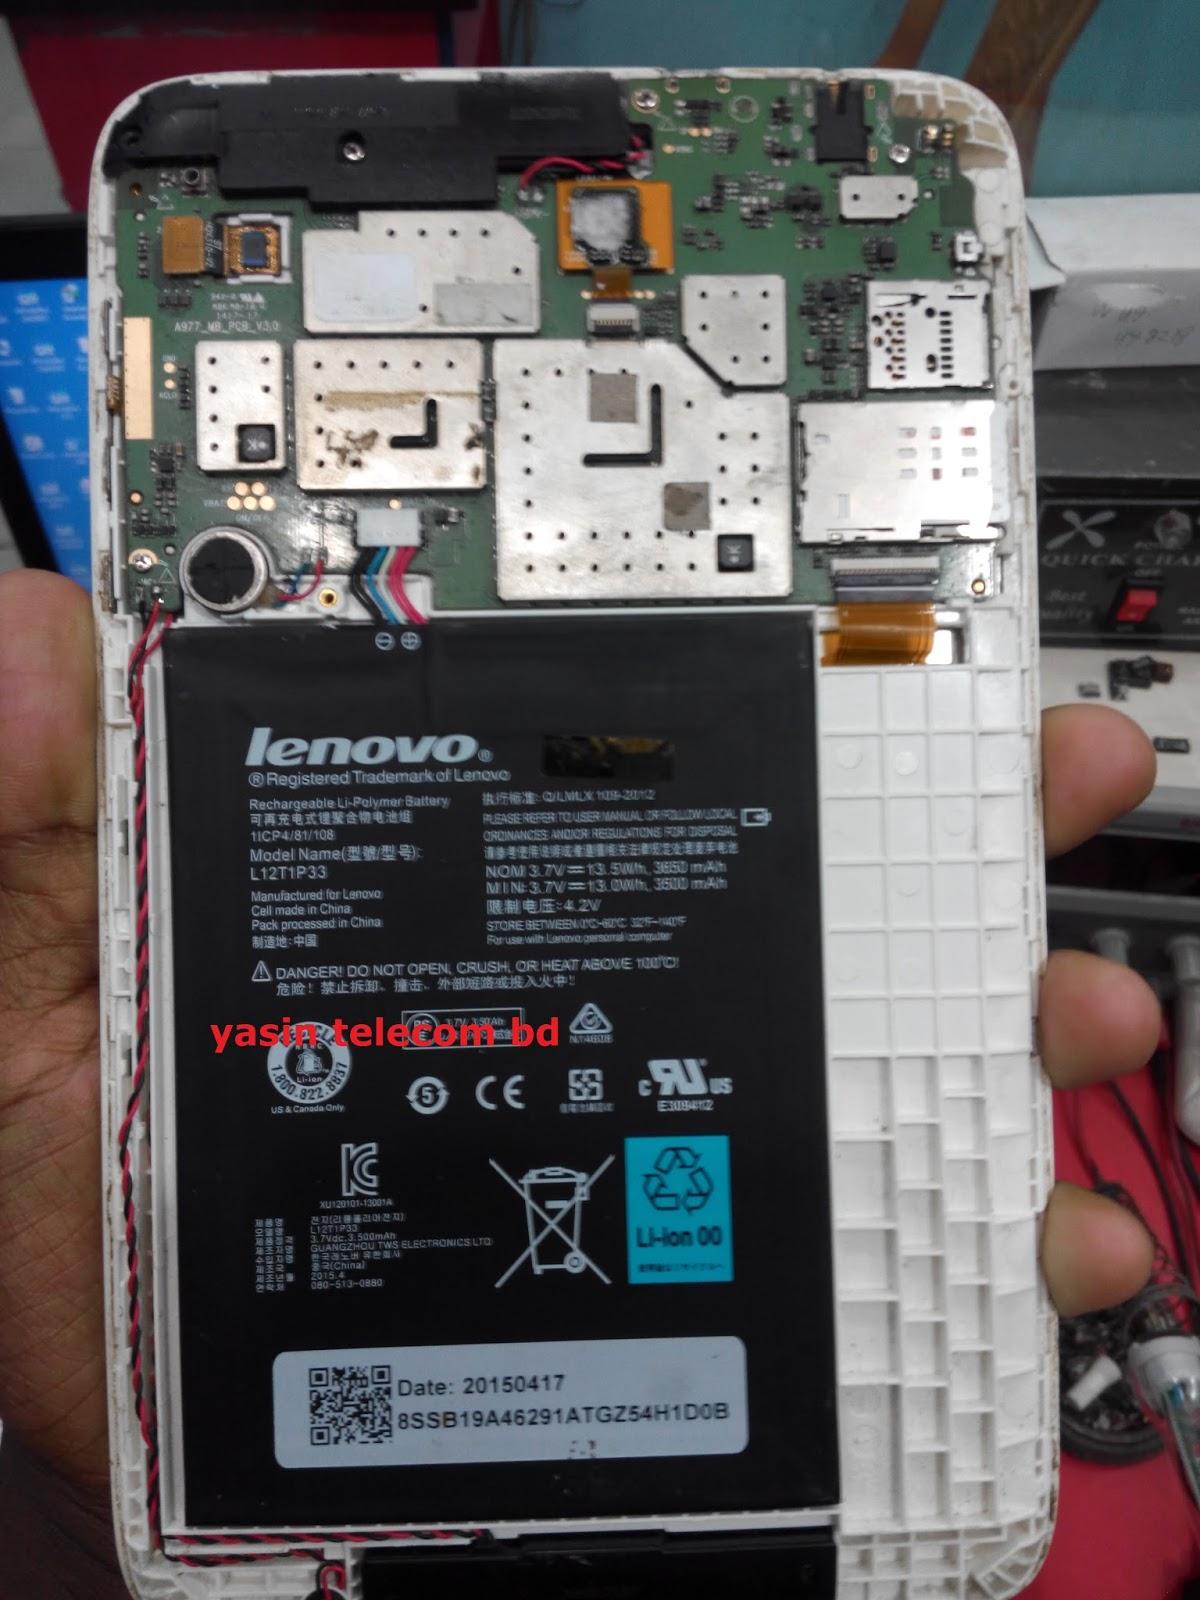 YASIN TELECOM BD: LENOVO L12T1P33 FLASH FILE CPU: MT6582